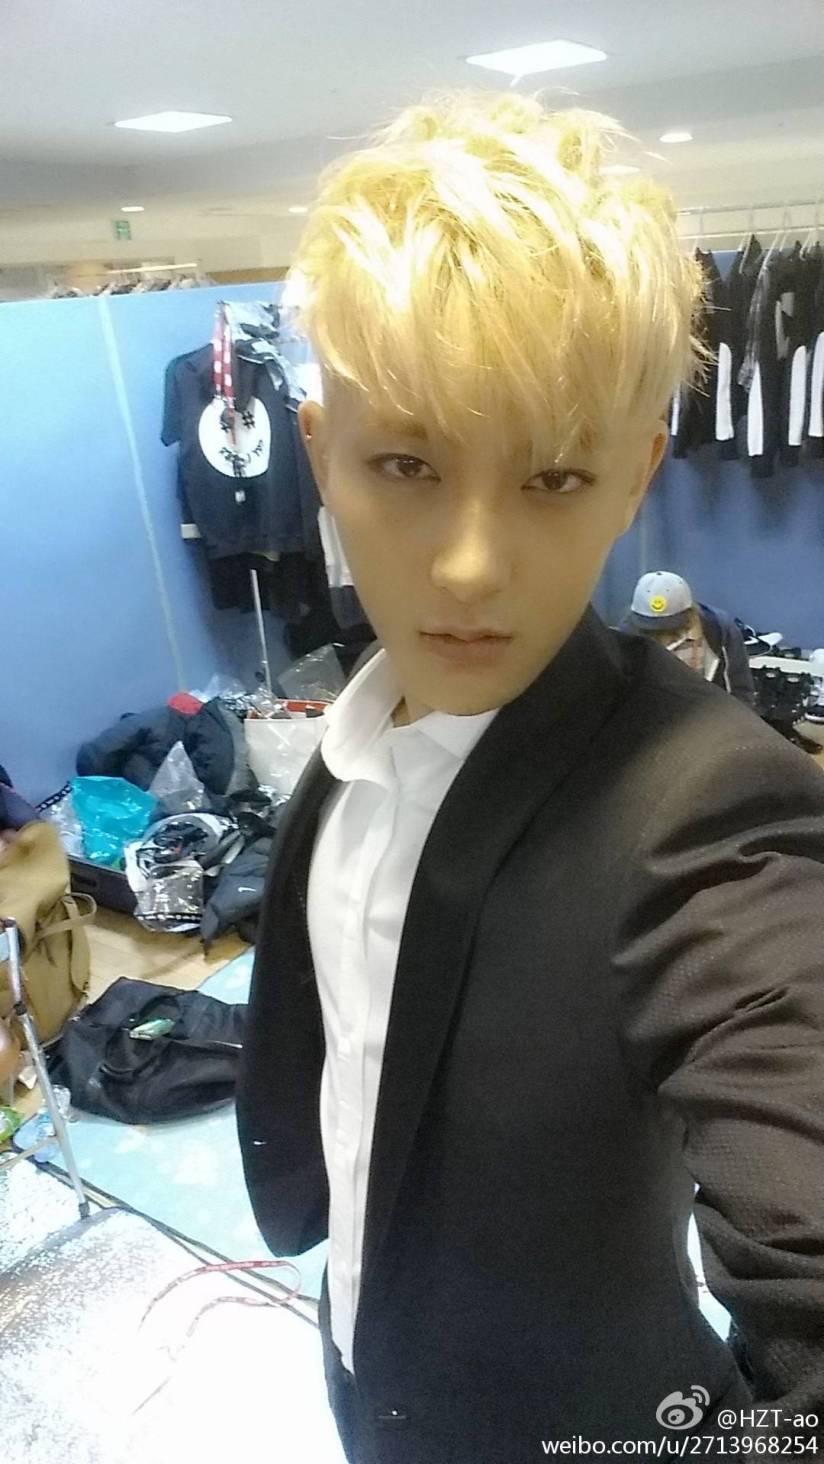 [140728] Tao (EXO) New Selca via Tao's Weibo [3]